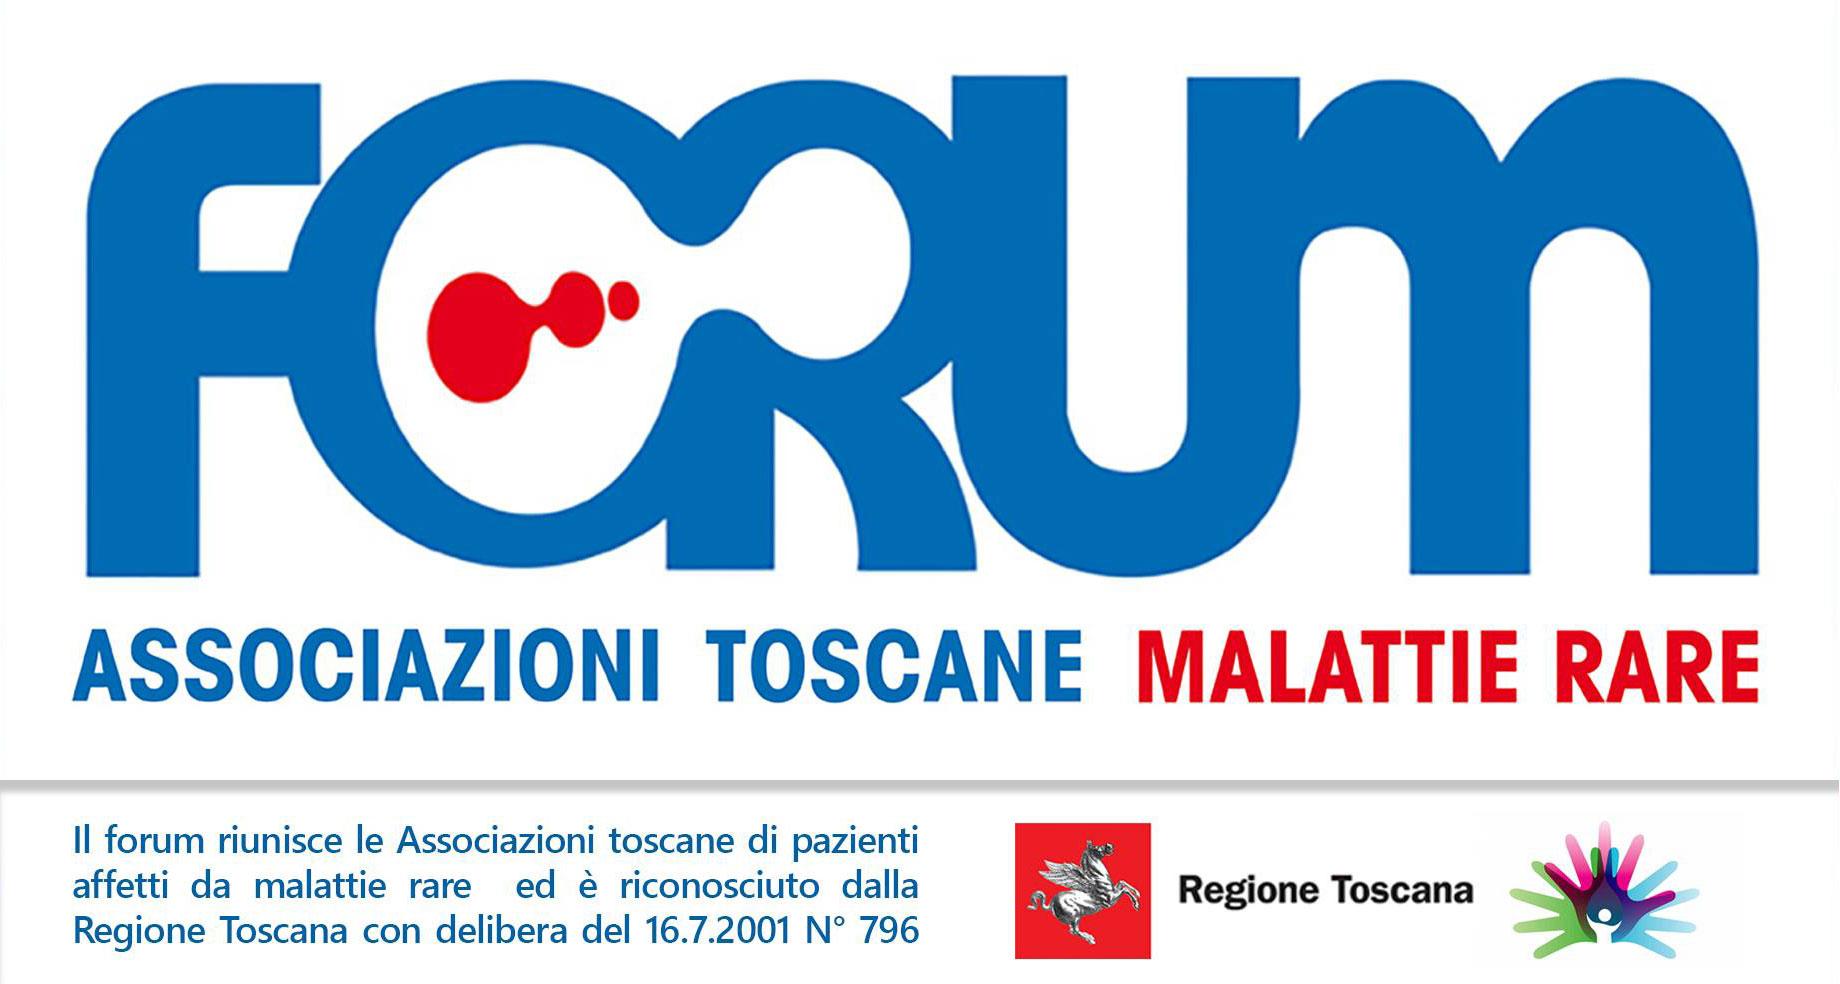 Forum Associazioni Toscane Malattie